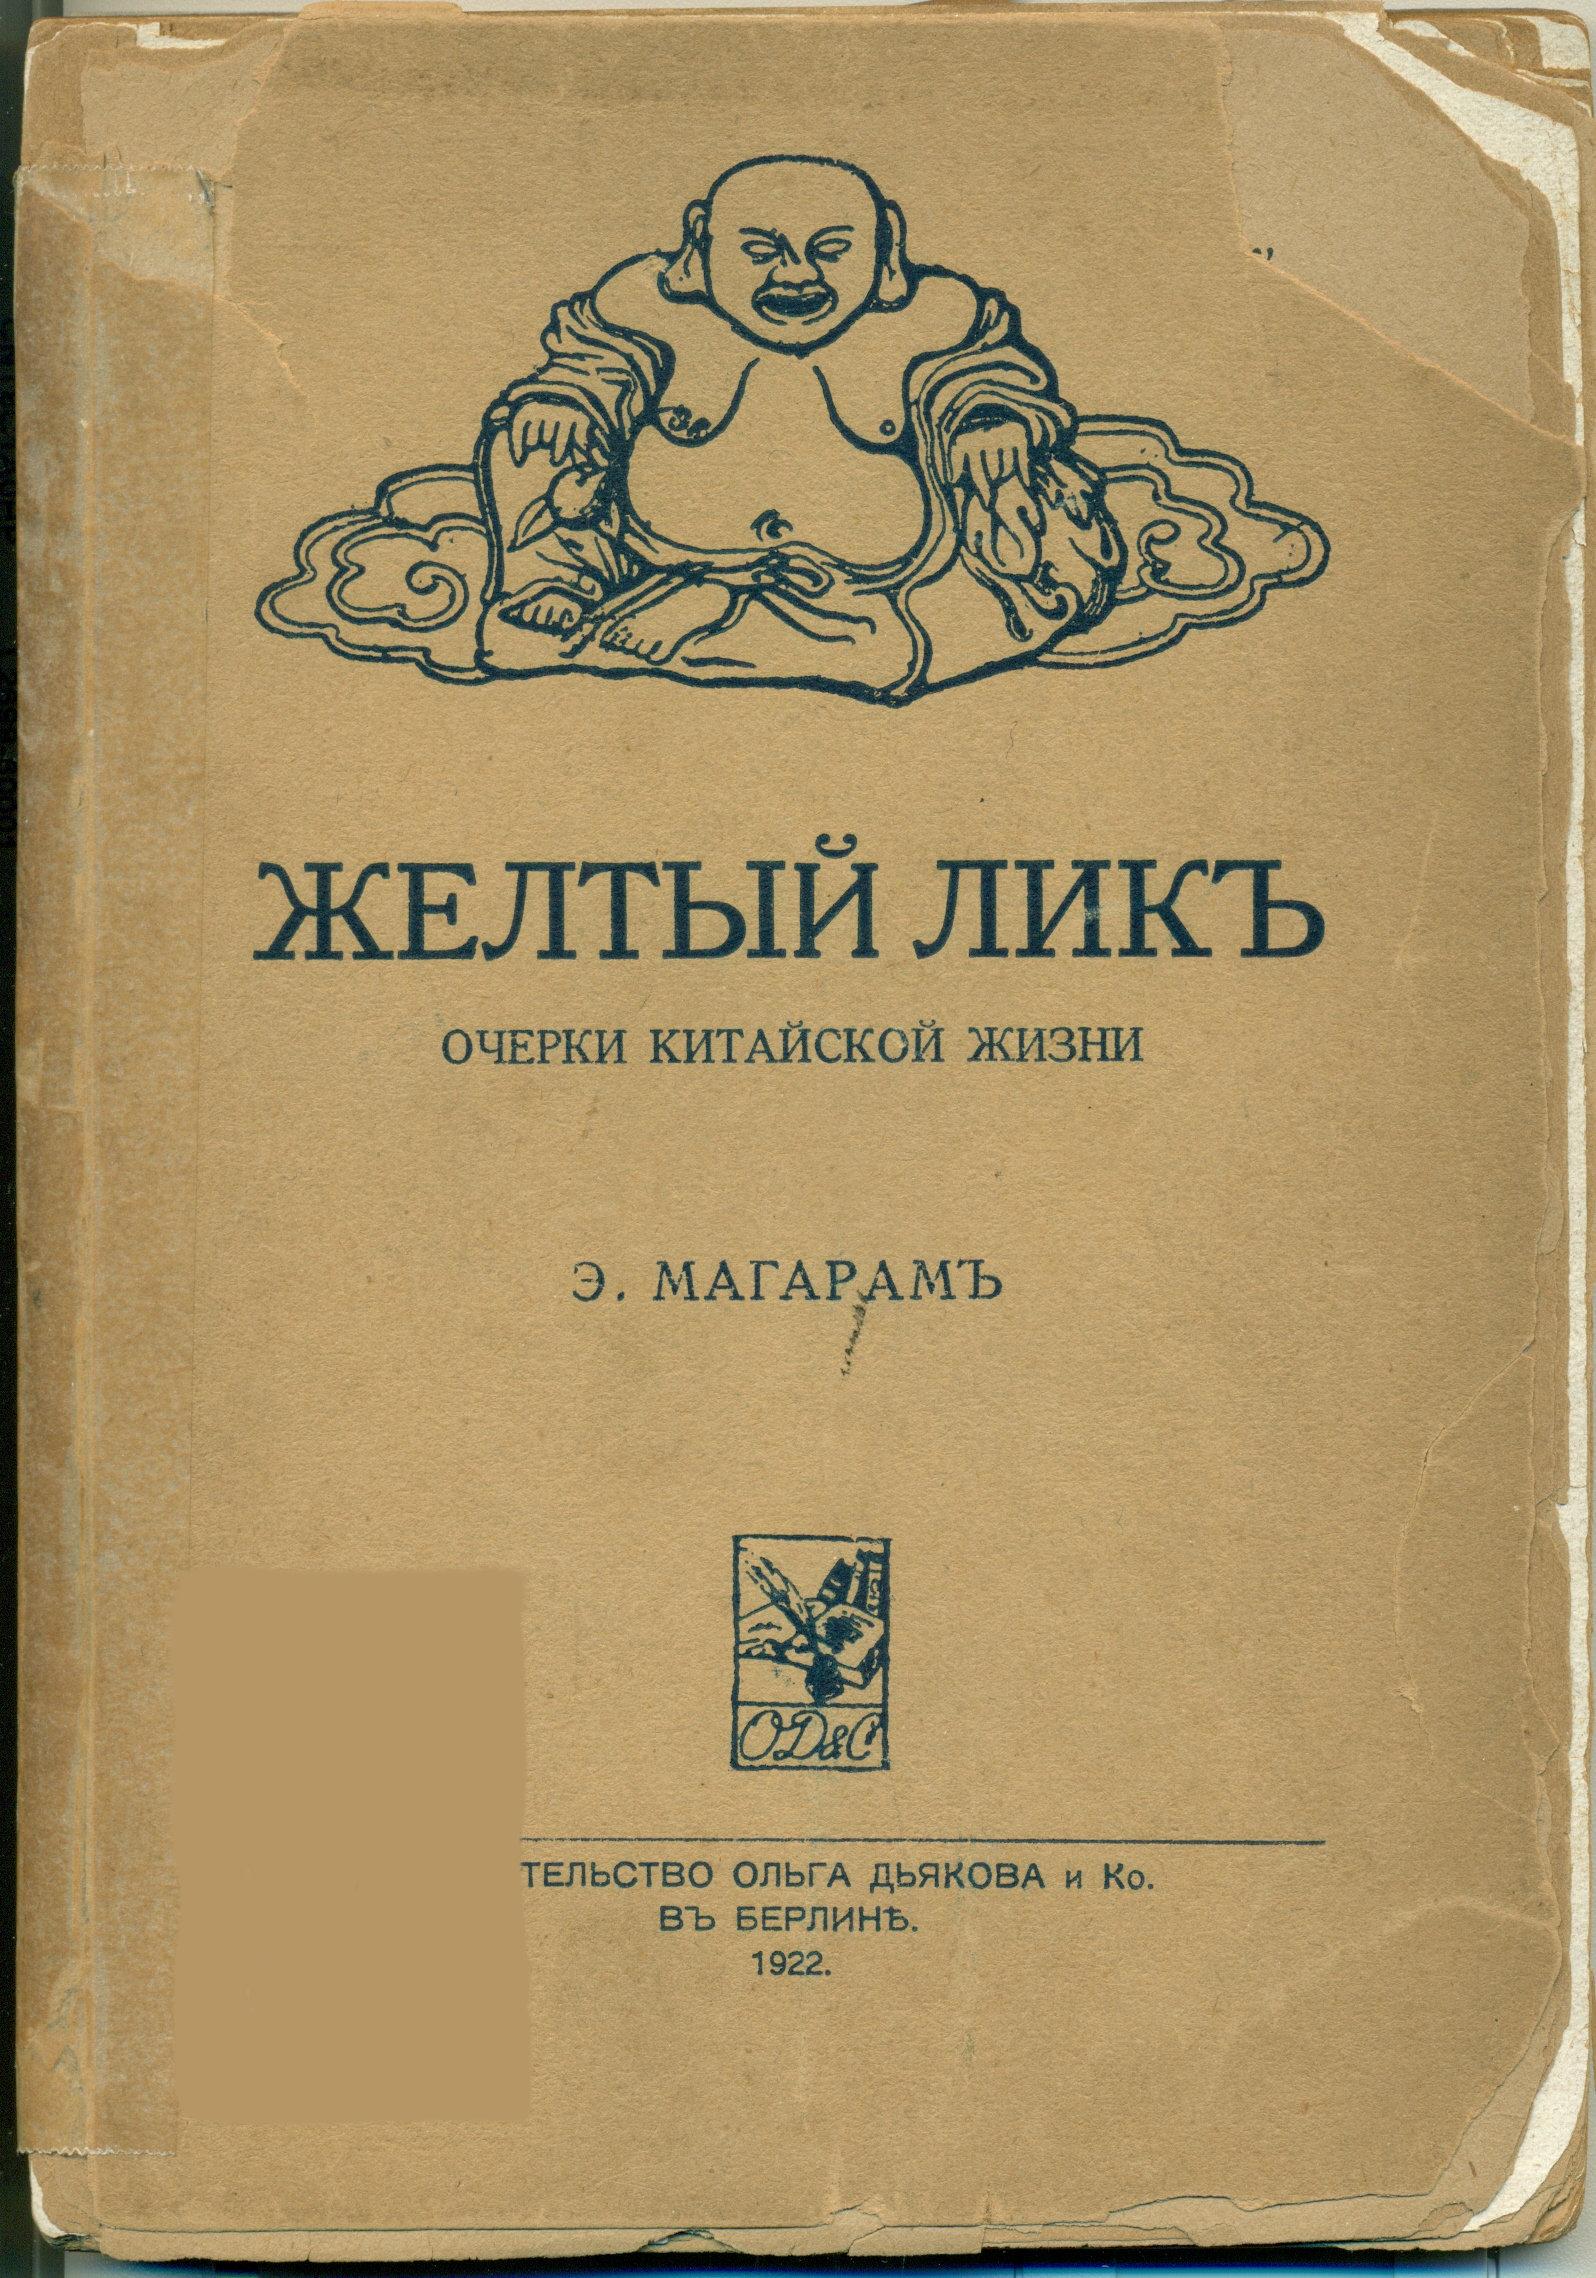 Cover of Zheltyi lik